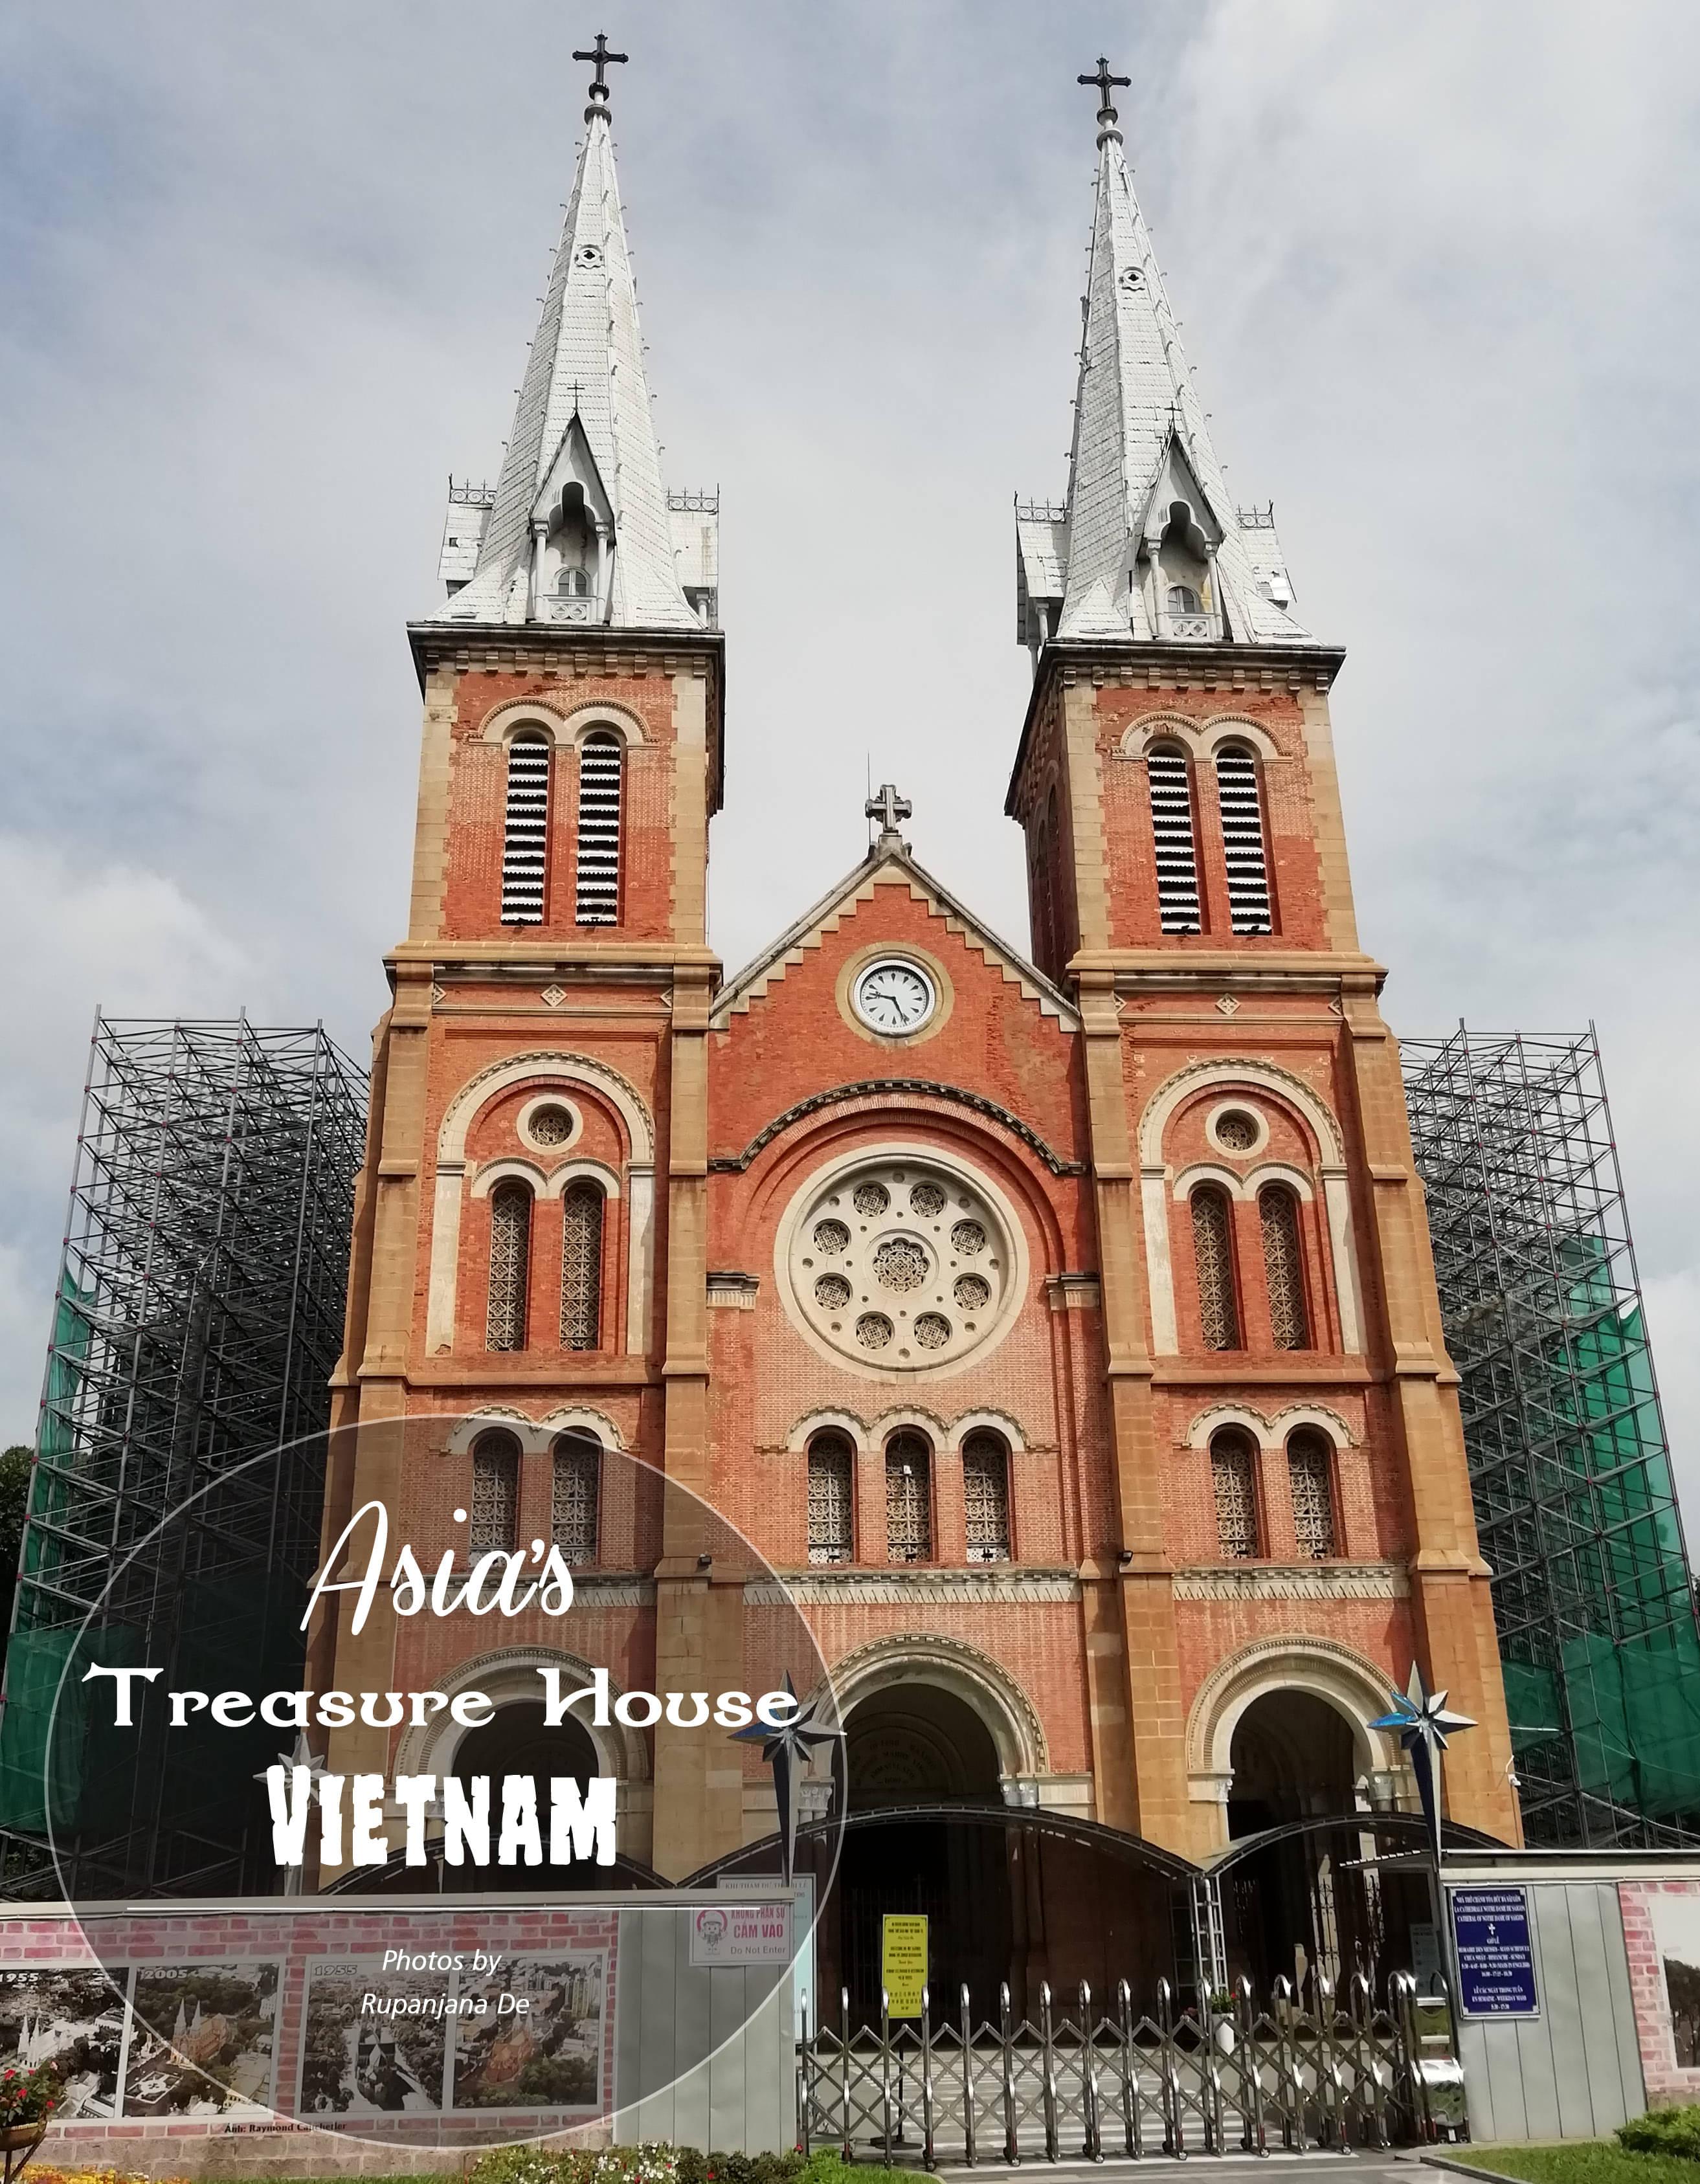 Asia's Treasure House Vietnam